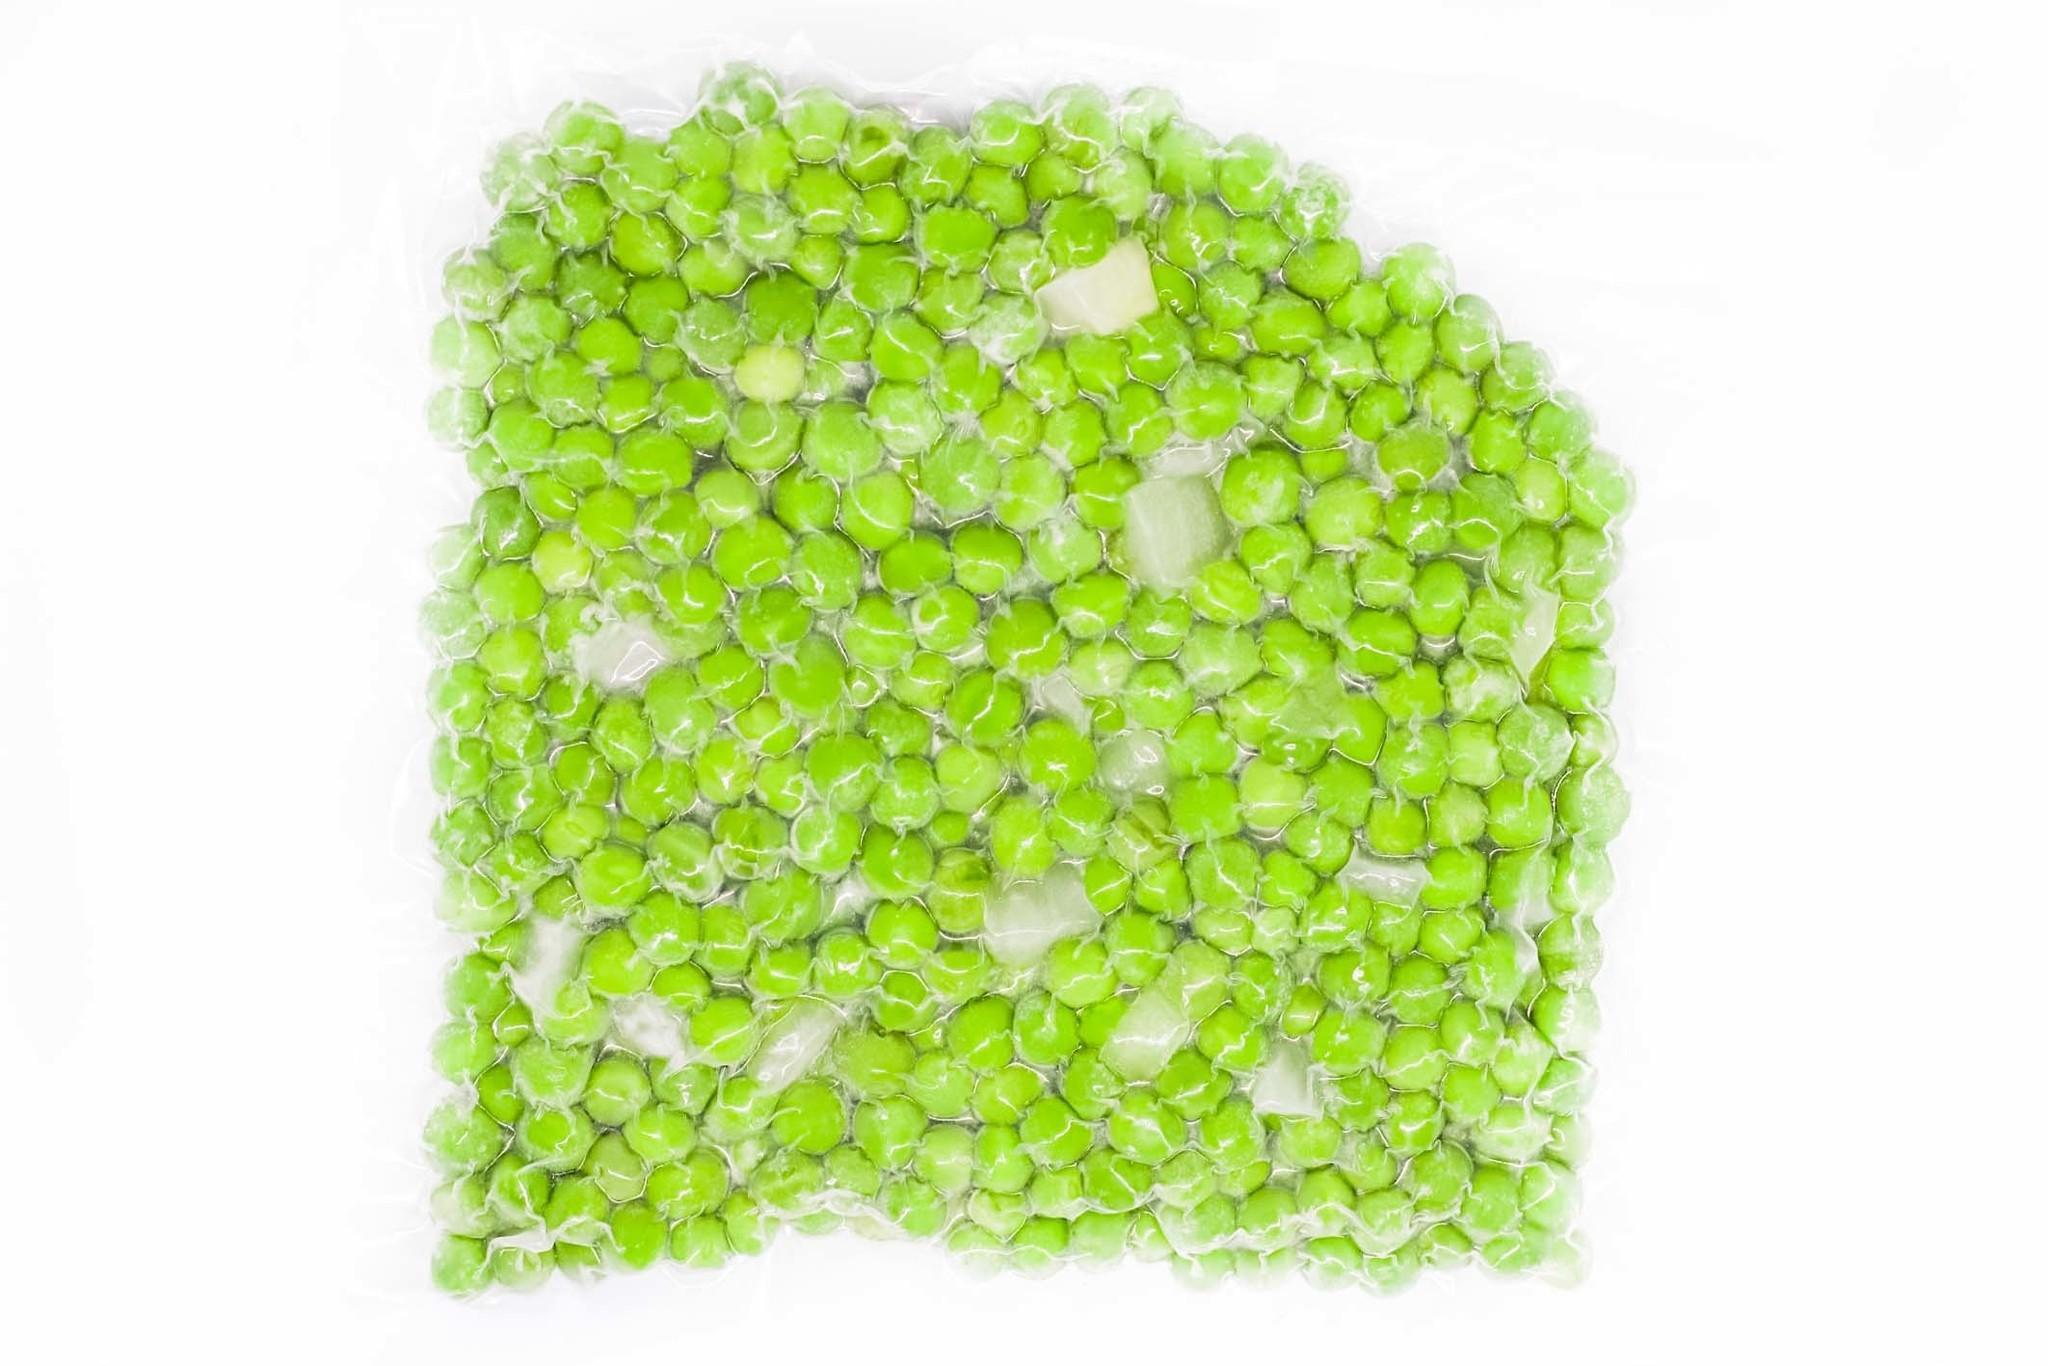 Green peas & onions